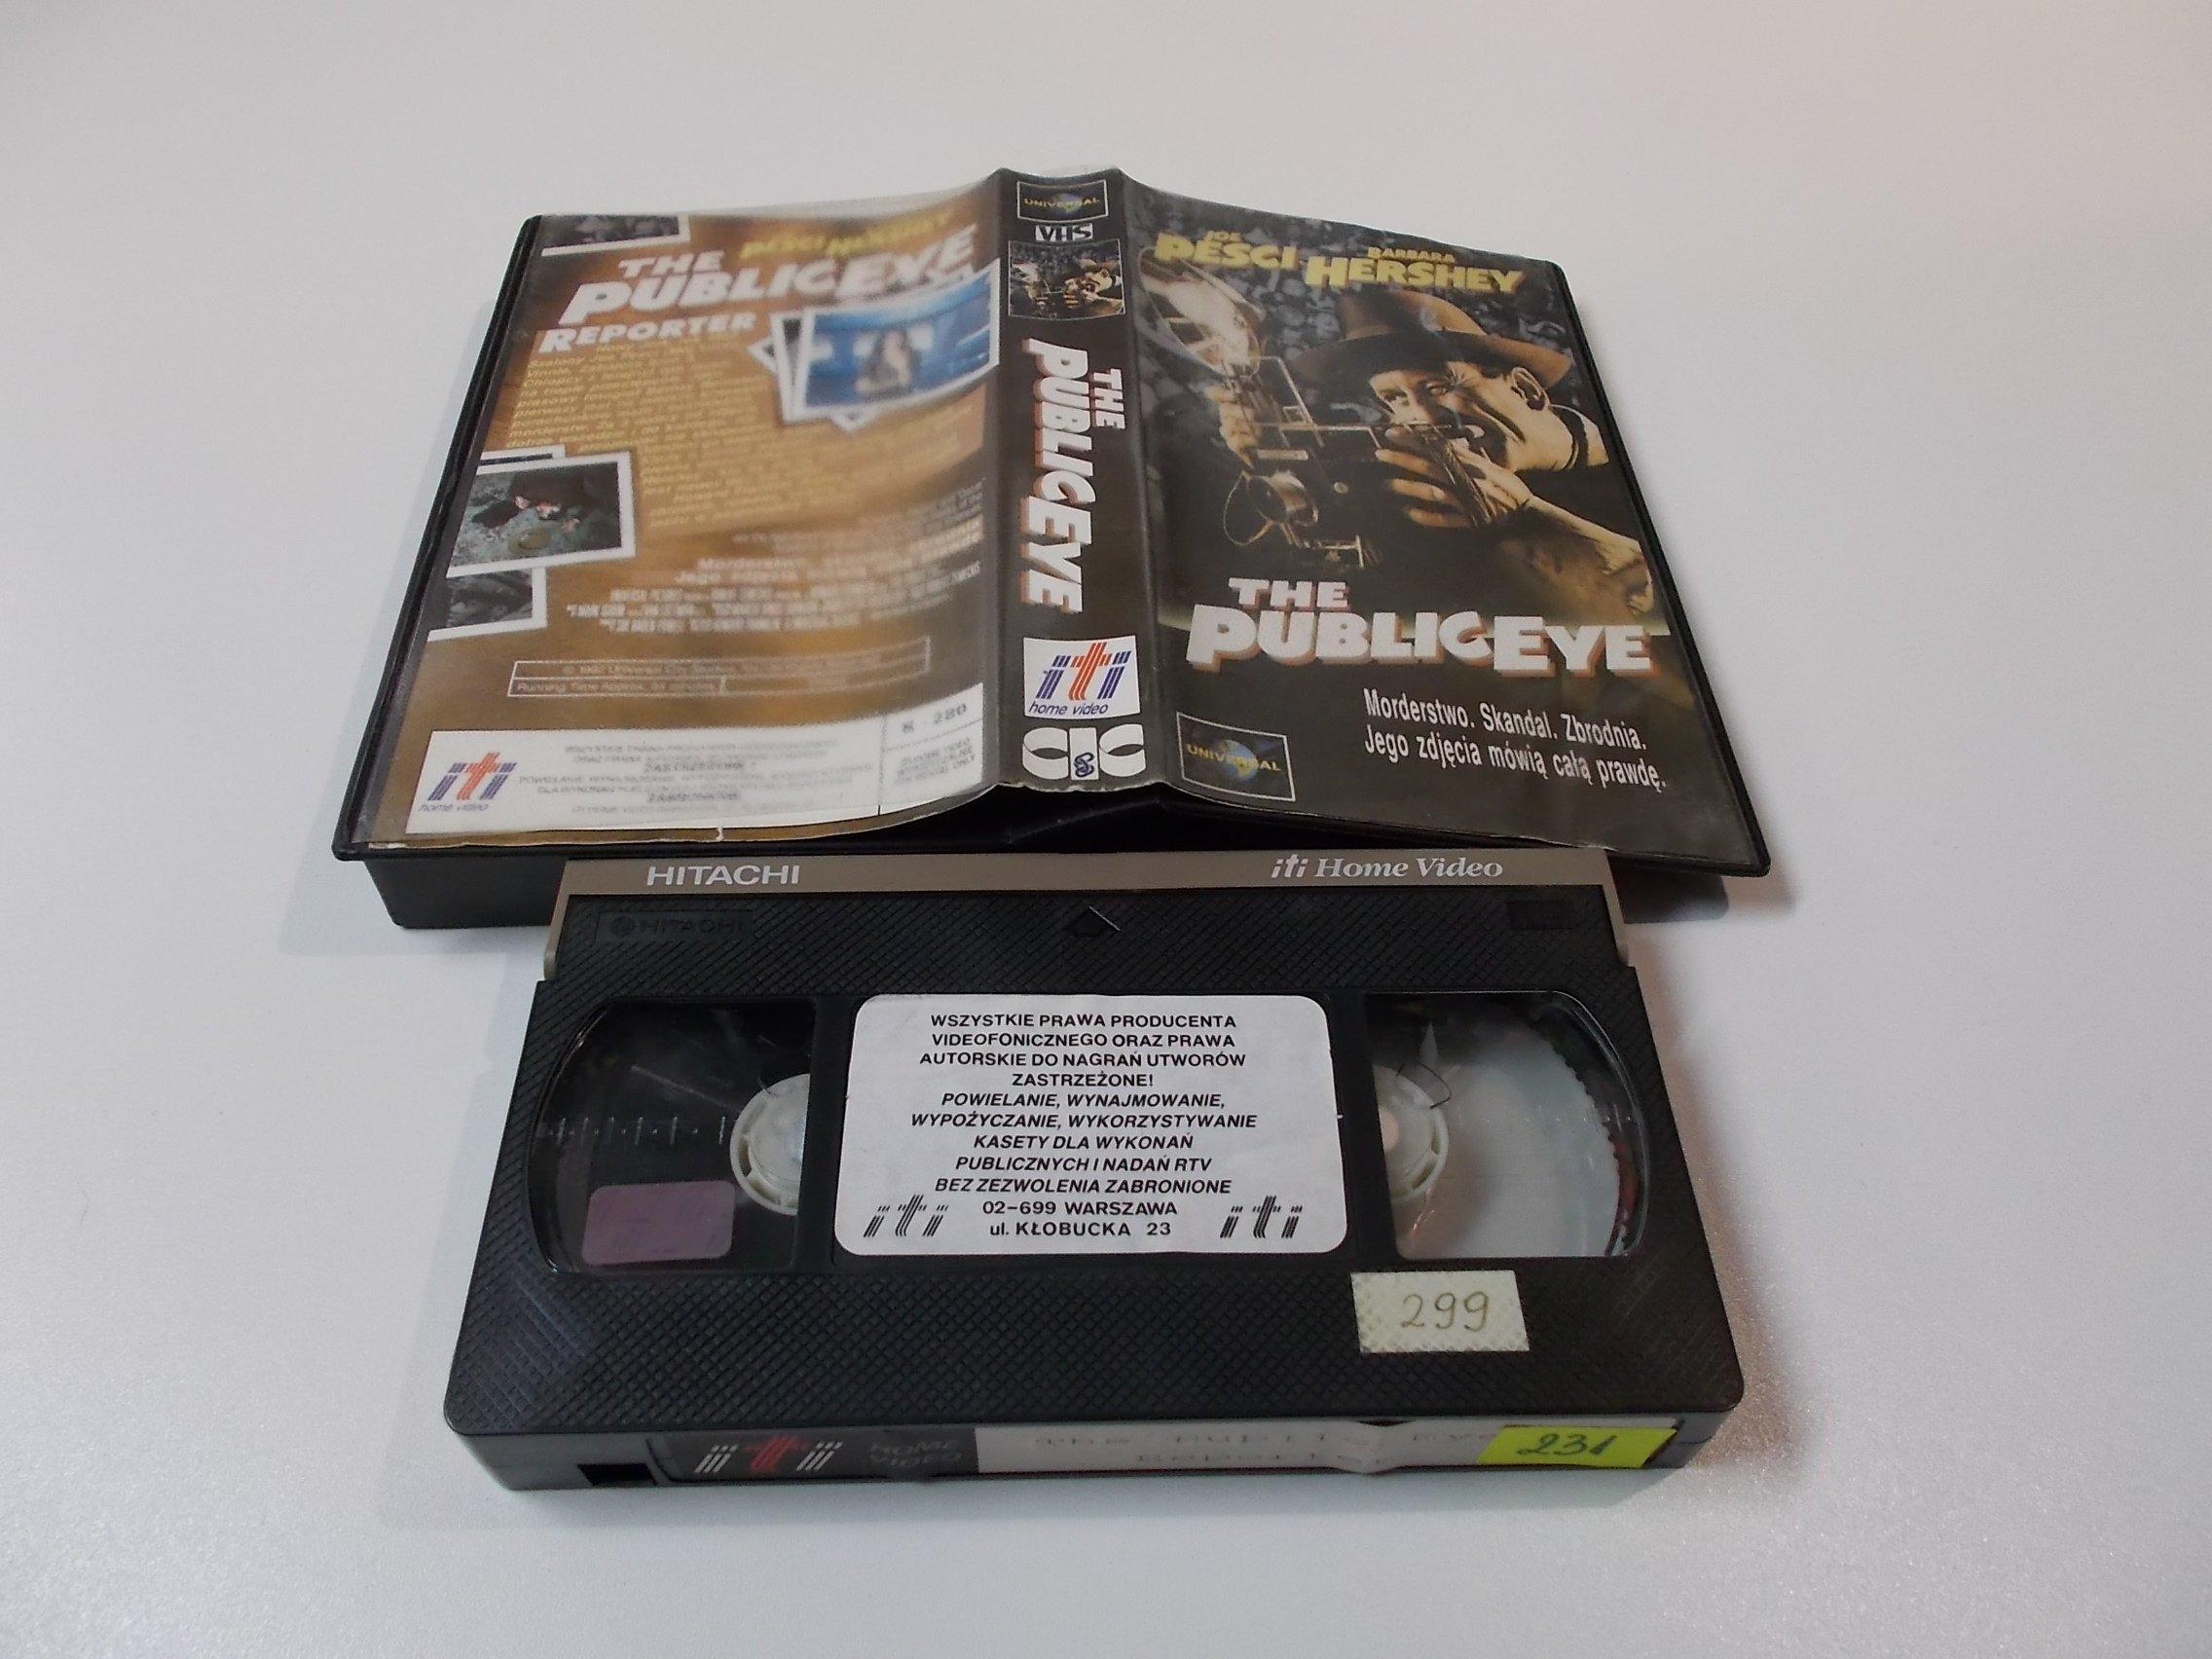 REPORTER - Joe Pesci Barbara Hershey - Kaseta Video VHS - Opole 1549